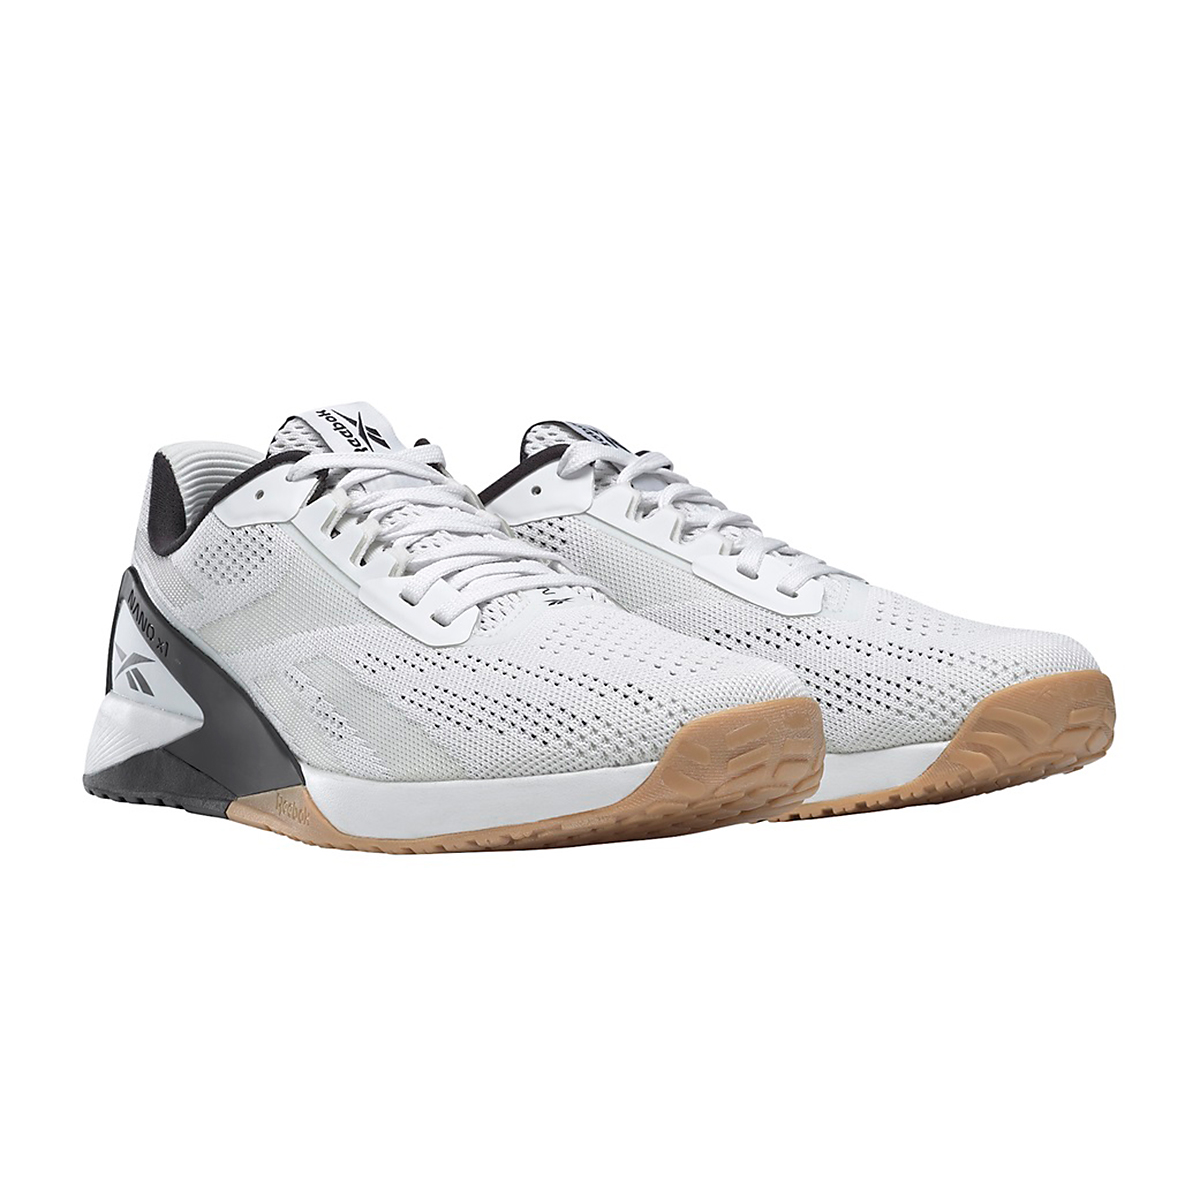 Men's Reebok Nano X1 Training Shoe - Color: White/Black/Reebok Rubber Gum - Size: 6 - Width: Regular, White/Black/Reebok Rubber Gum, large, image 3